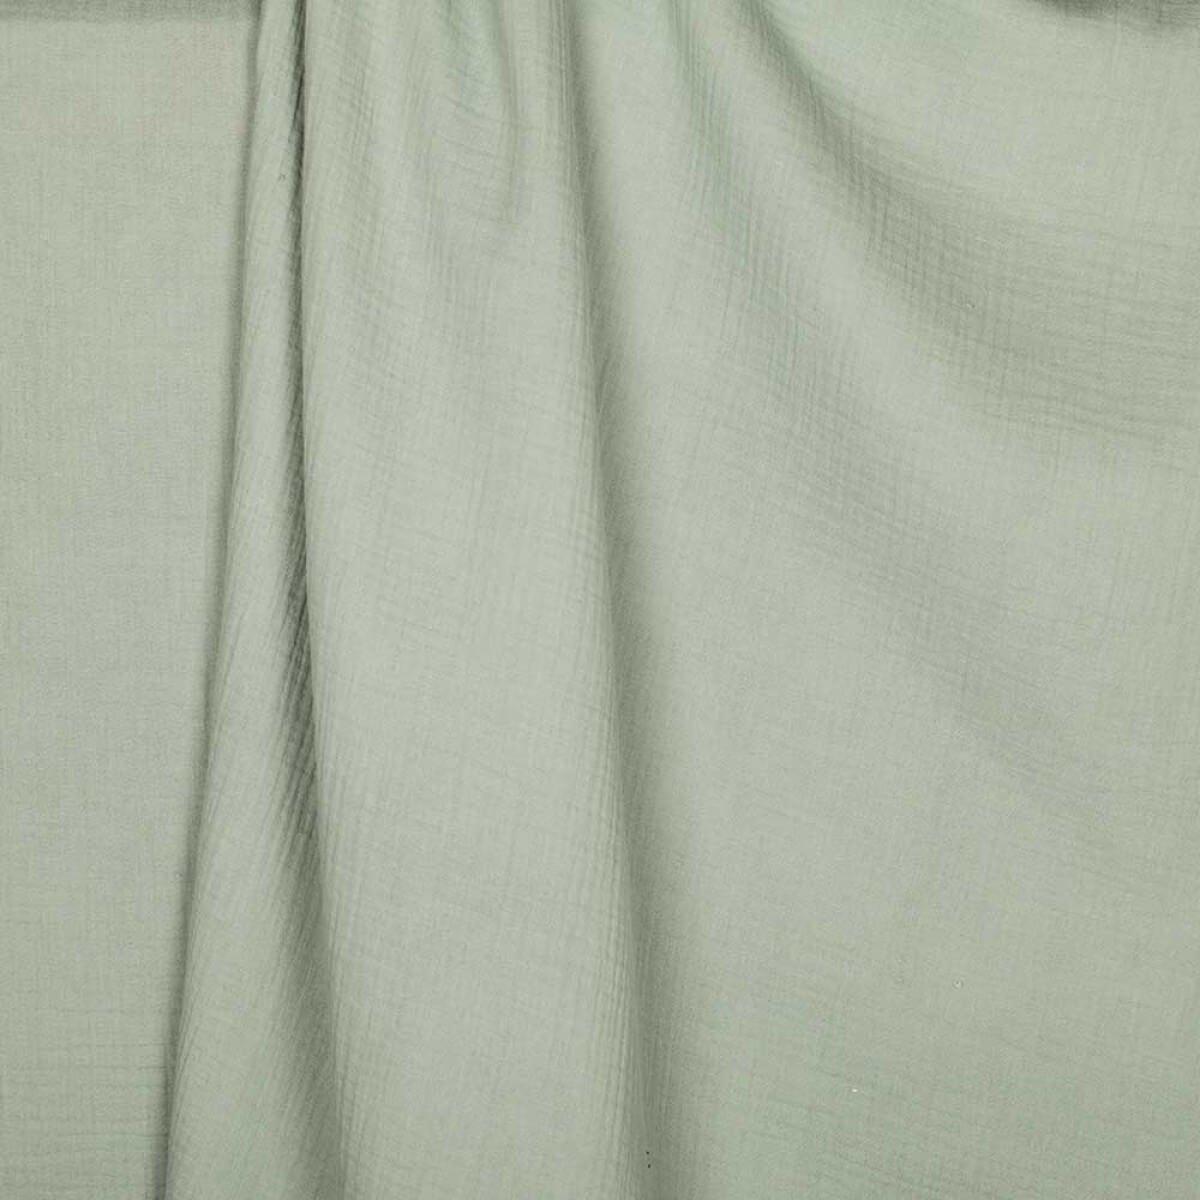 CAREFIL Tejido algodón Doble Gasa – Verde Almendra – par 50 cm – Oeko-Tex ®: Amazon.es: Hogar